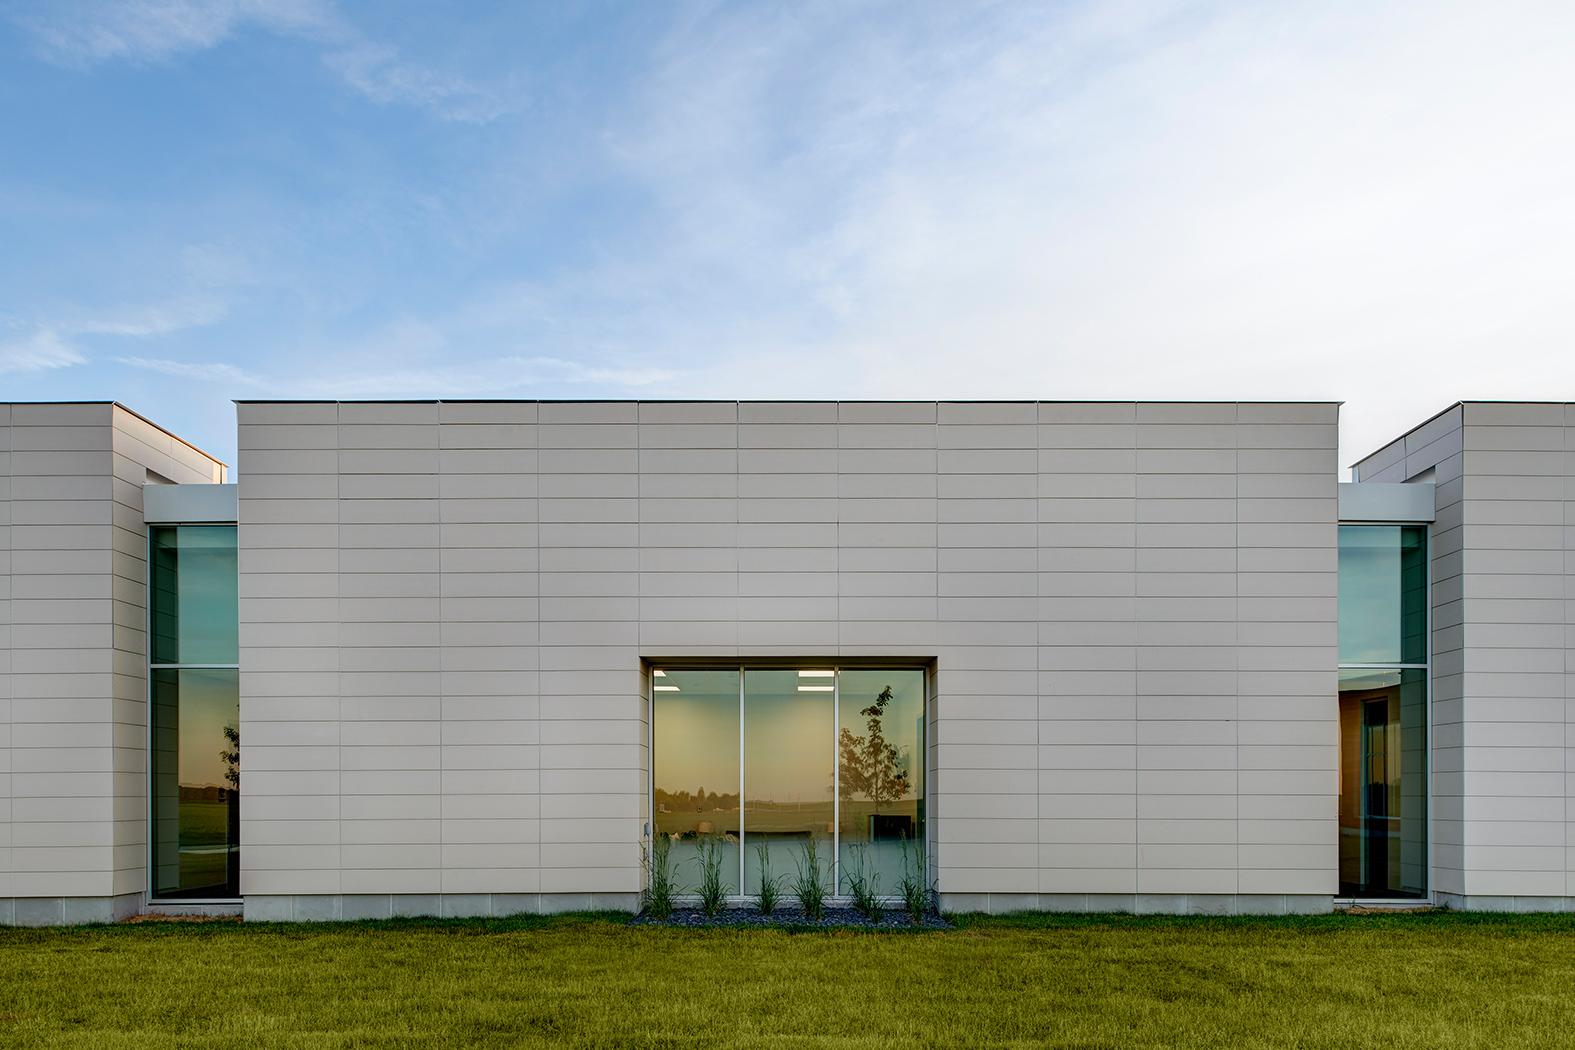 Cladding Corp - Story County Medical Center - Terra5 Terracotta Rainscreen Cladding